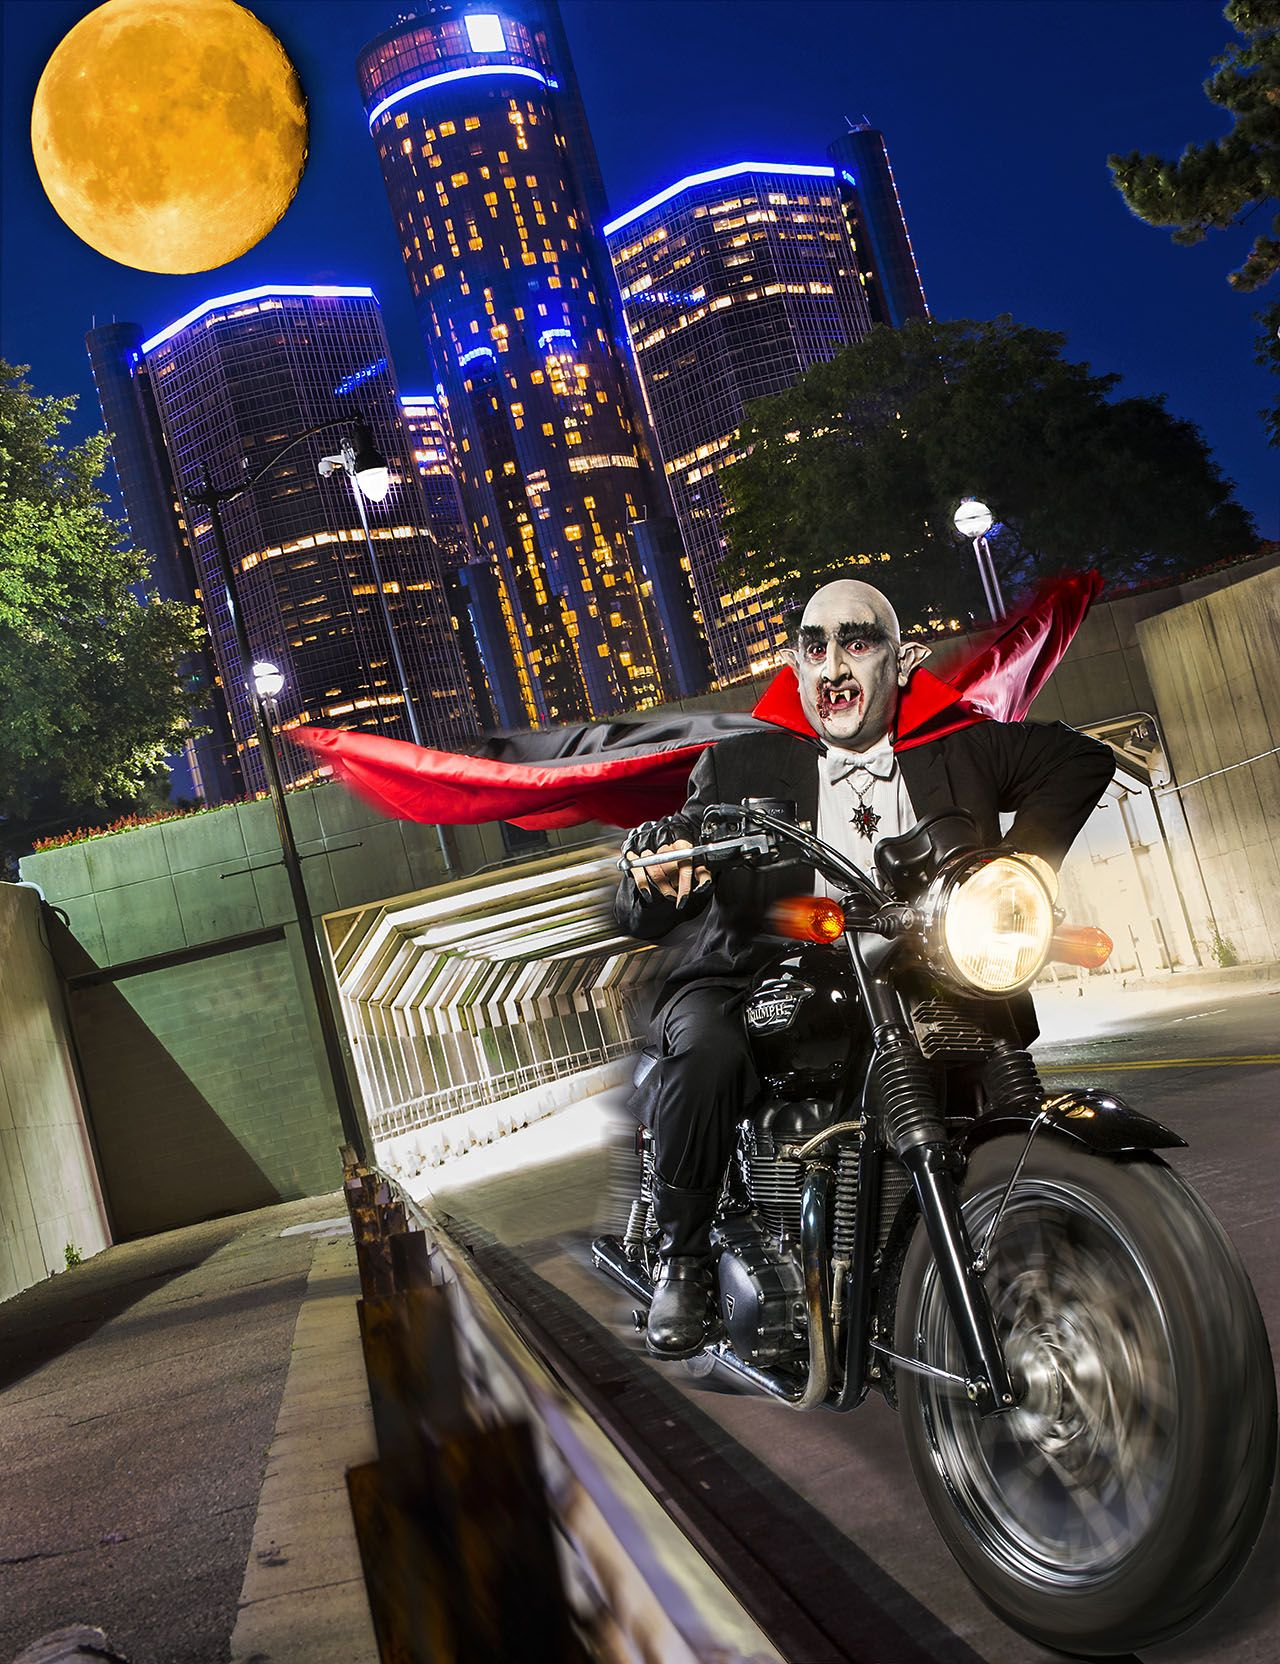 Vampire Motorcycle